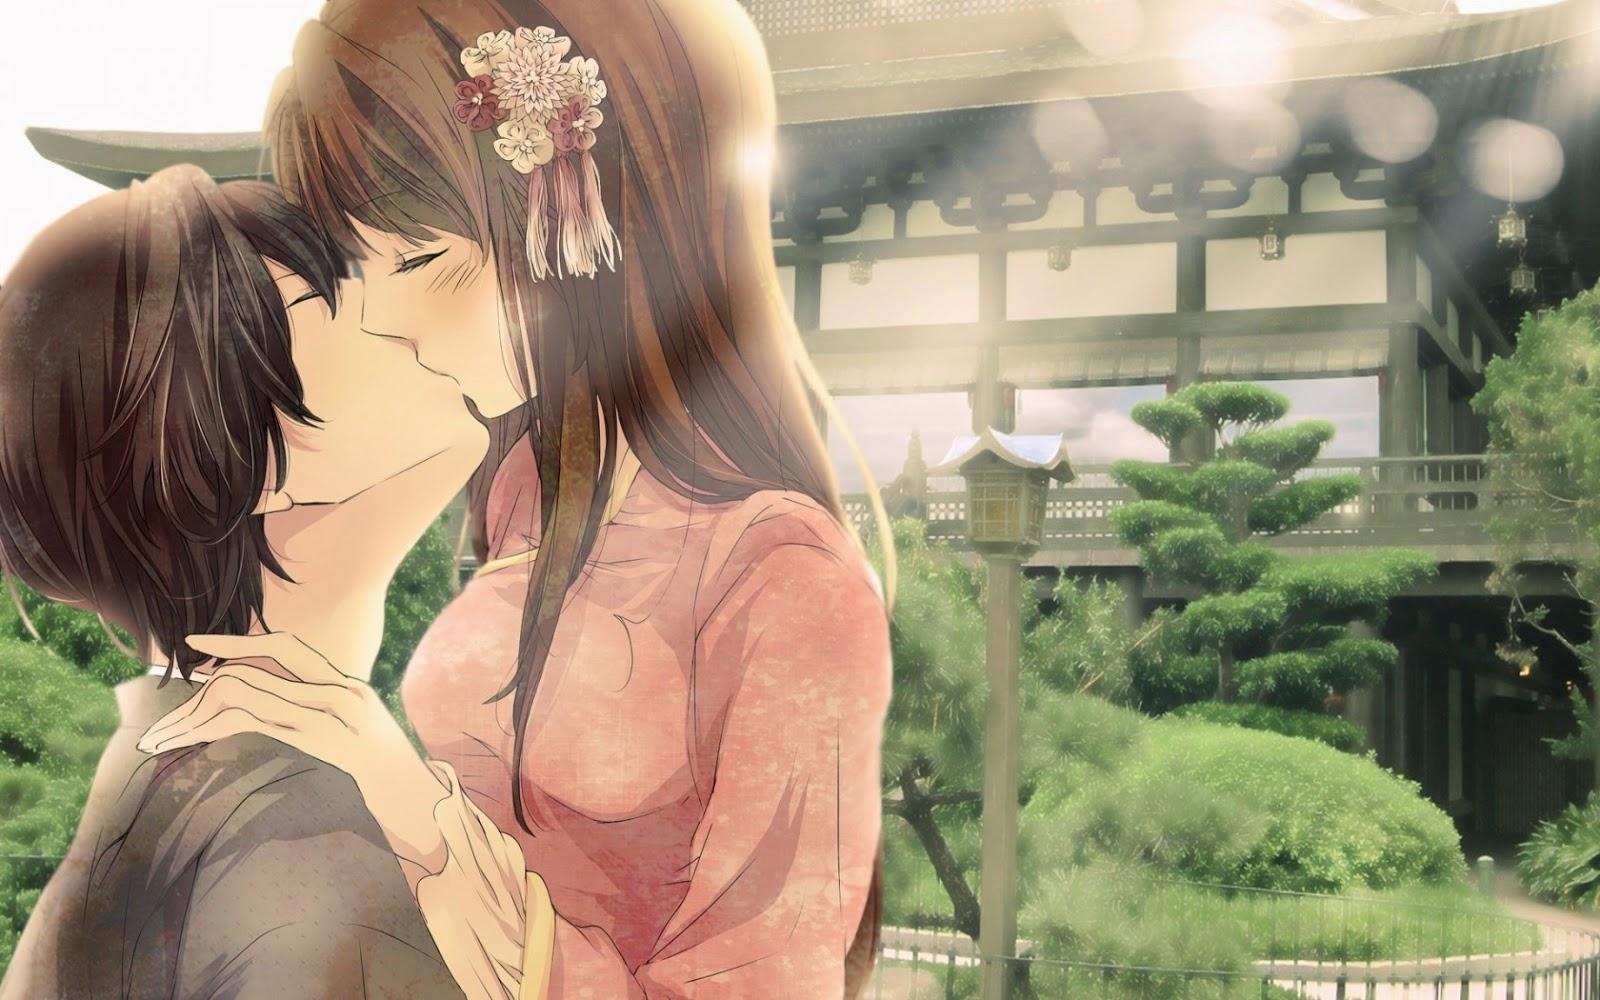 Gambar Ciuman Lucu Romantis Nusagates